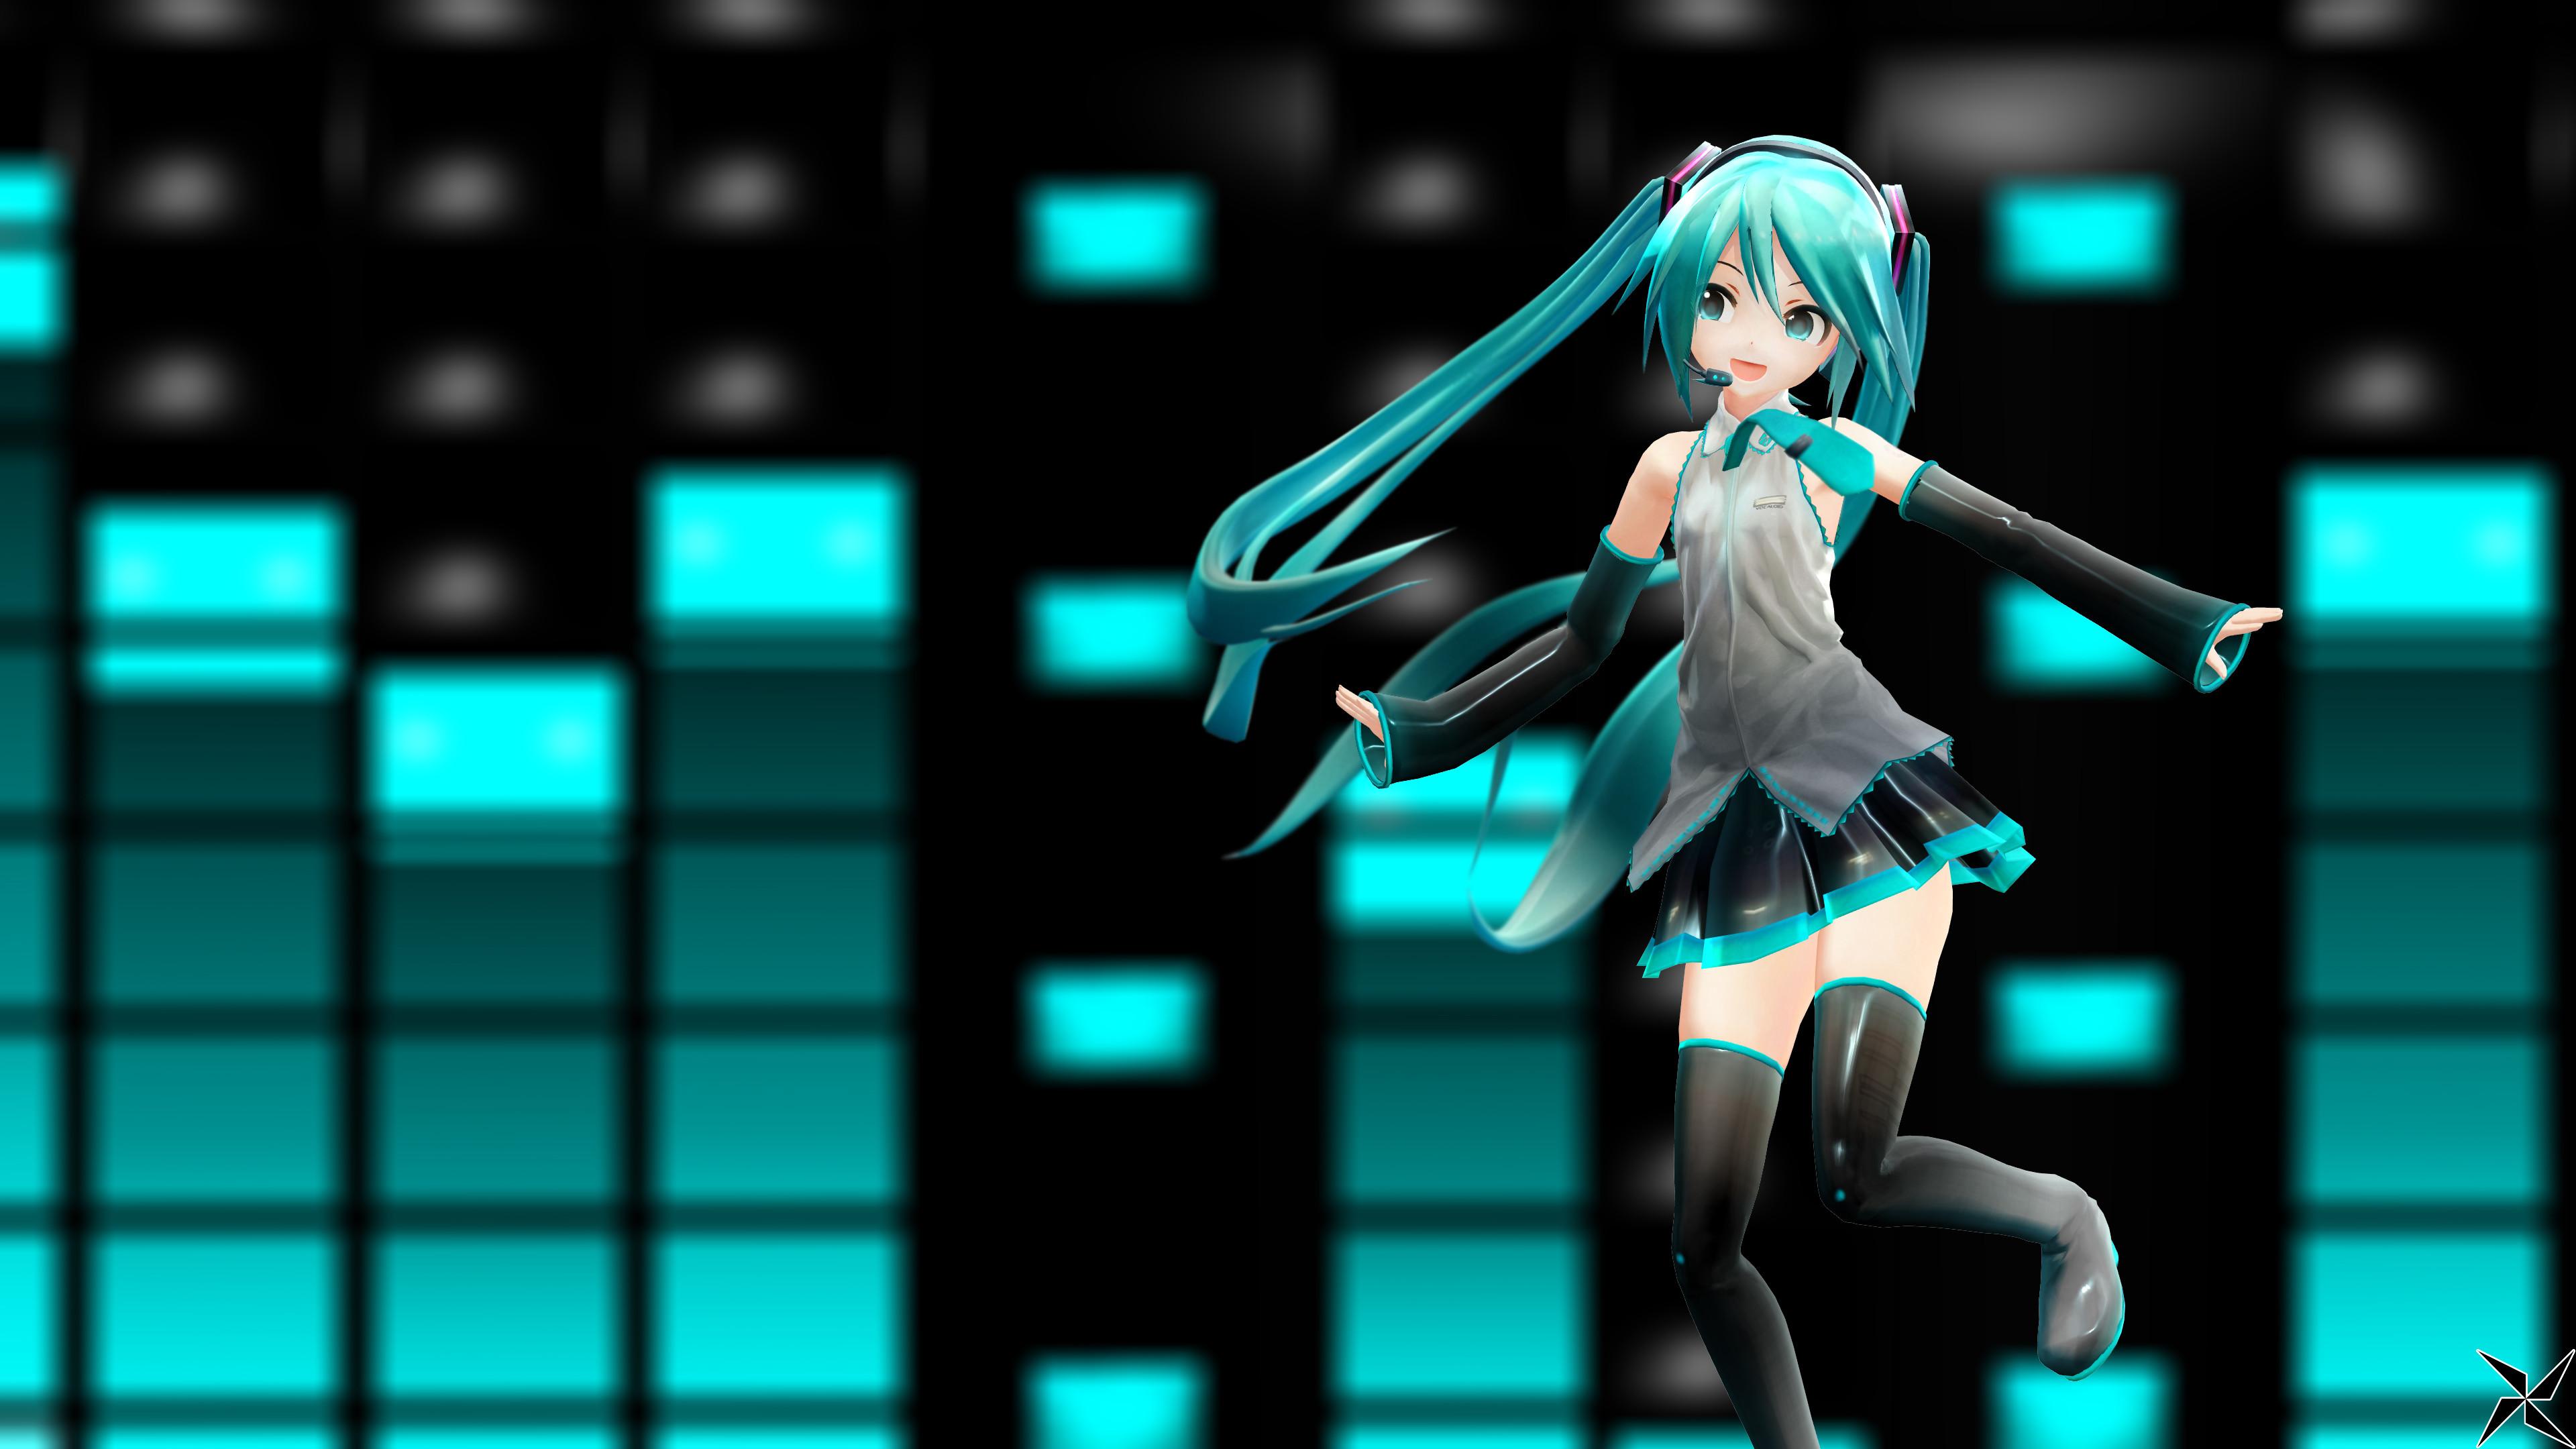 … MMD: Hatsune Miku – YouTube Banner (4K Wallpaper) by Suspeso